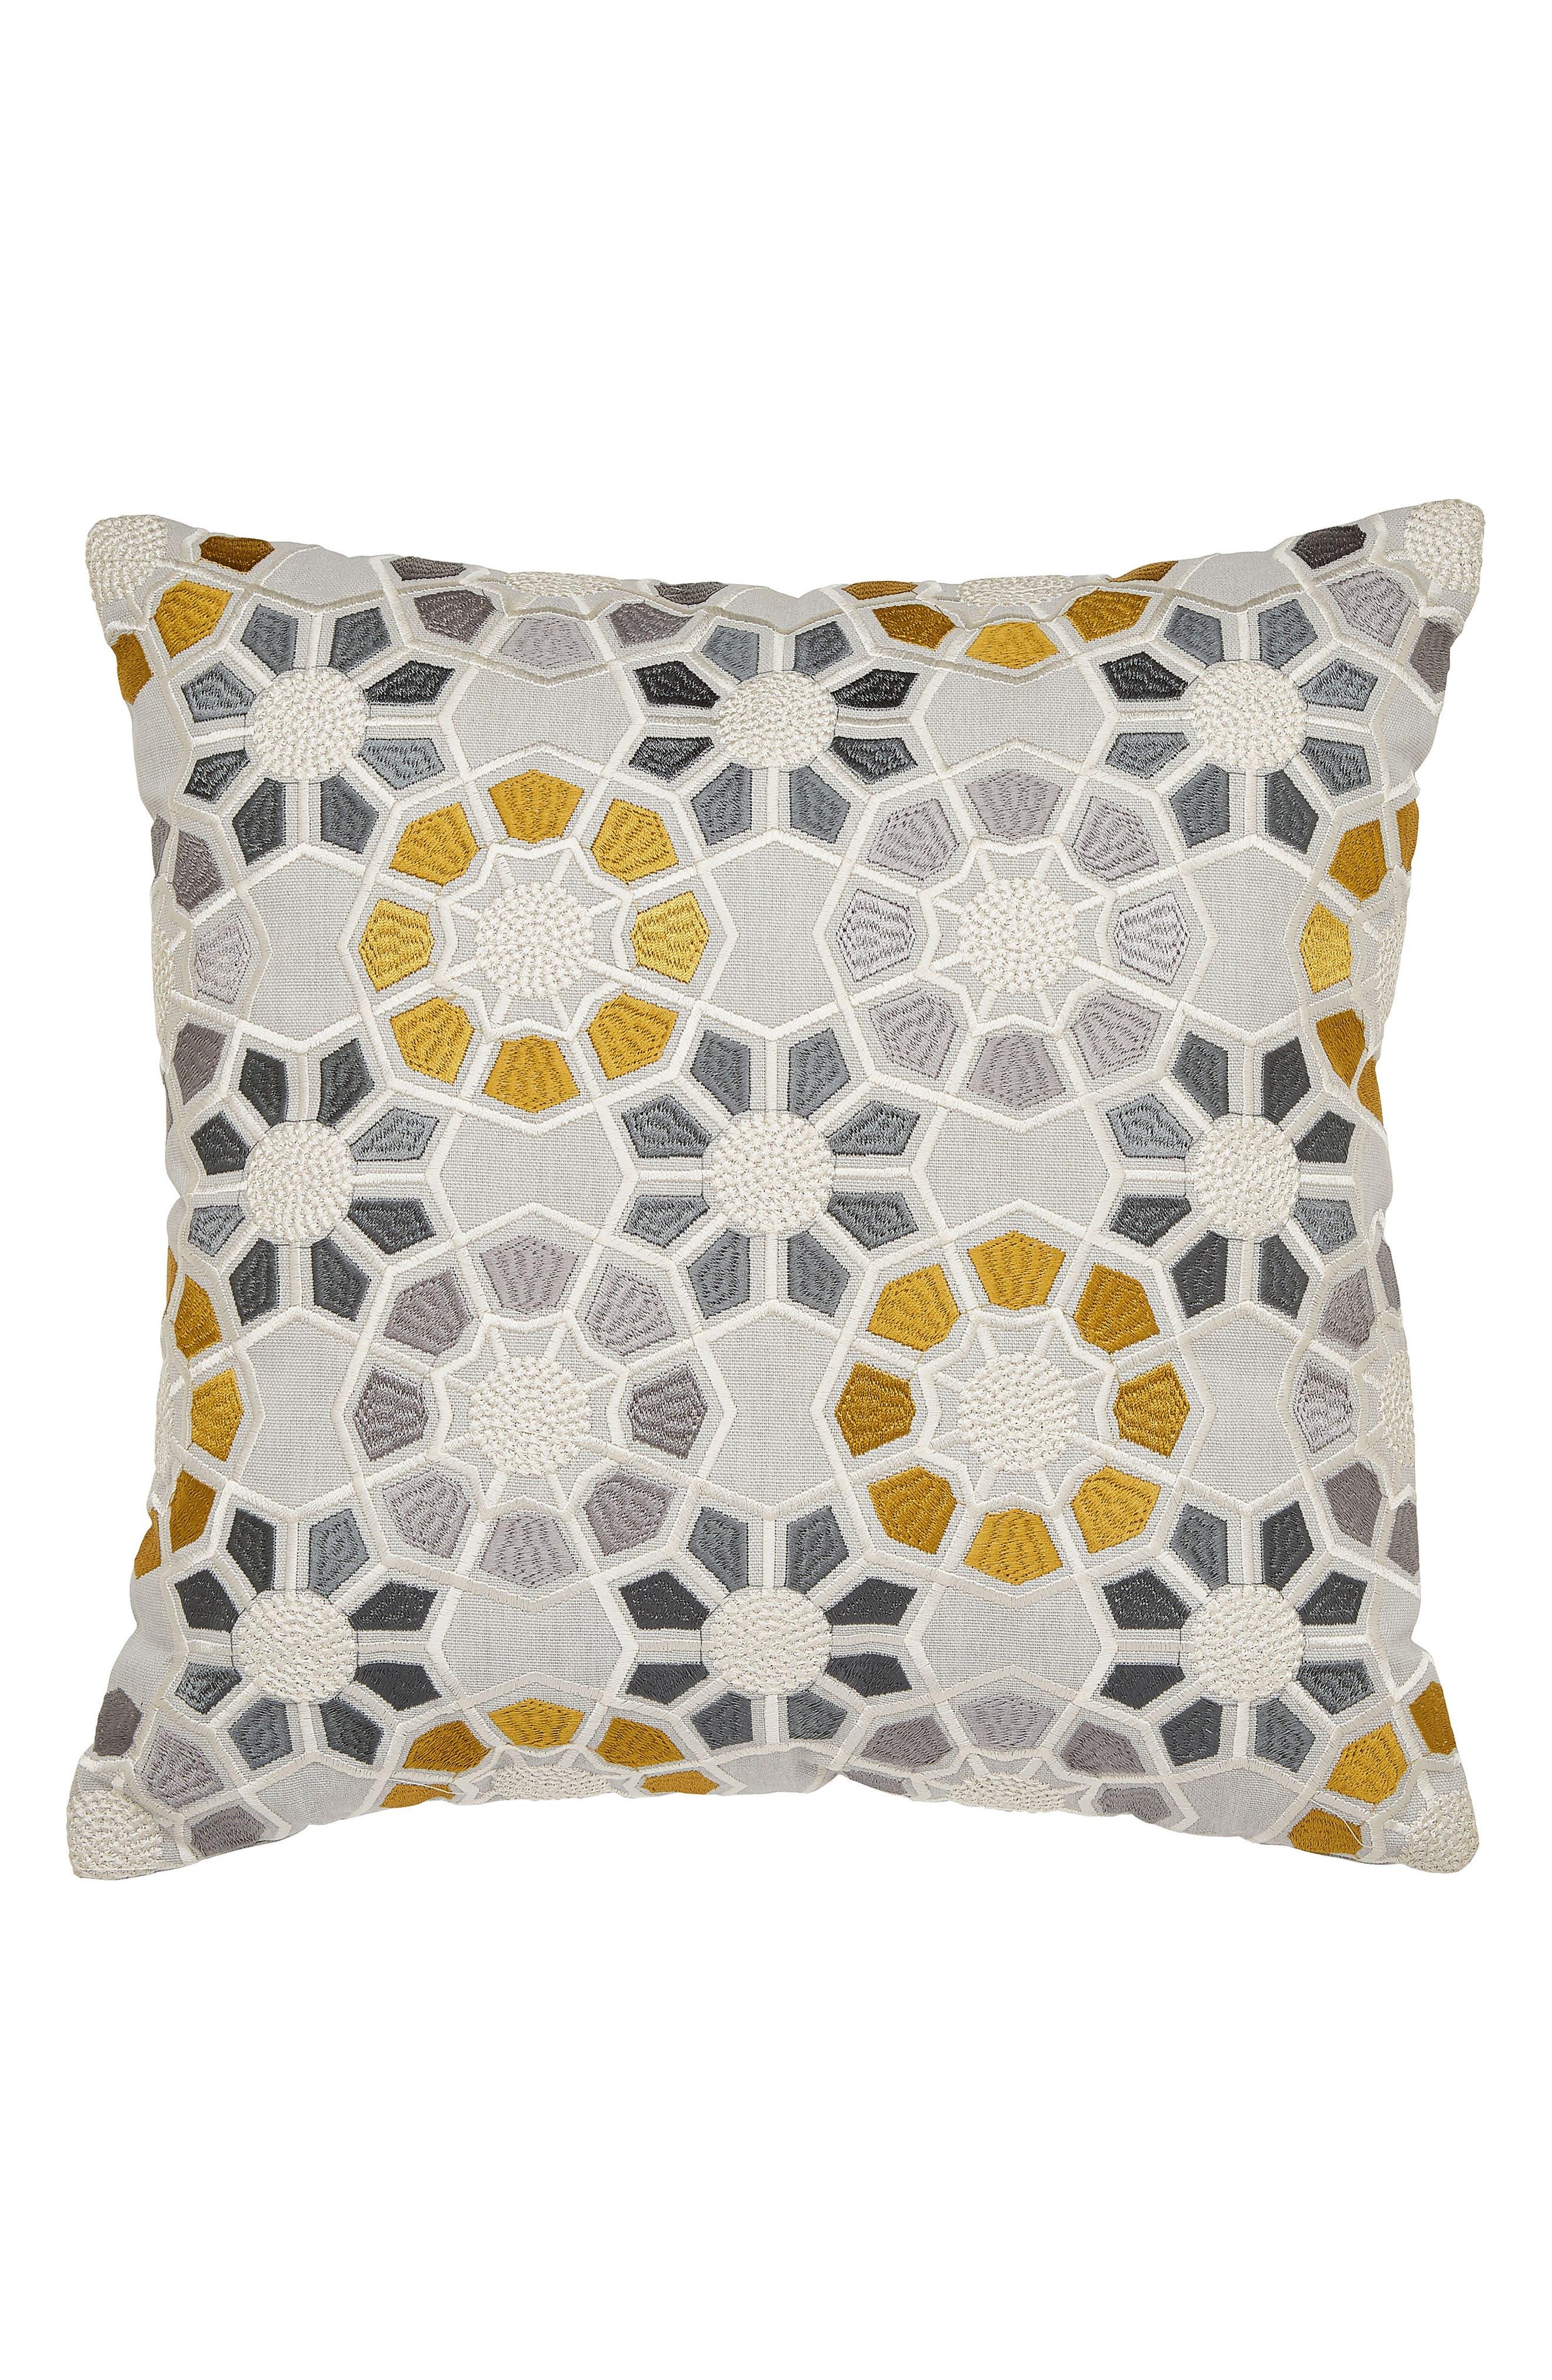 Ziba Duvet Cover, Sham & Accent Pillow Set,                             Alternate thumbnail 3, color,                             Grey